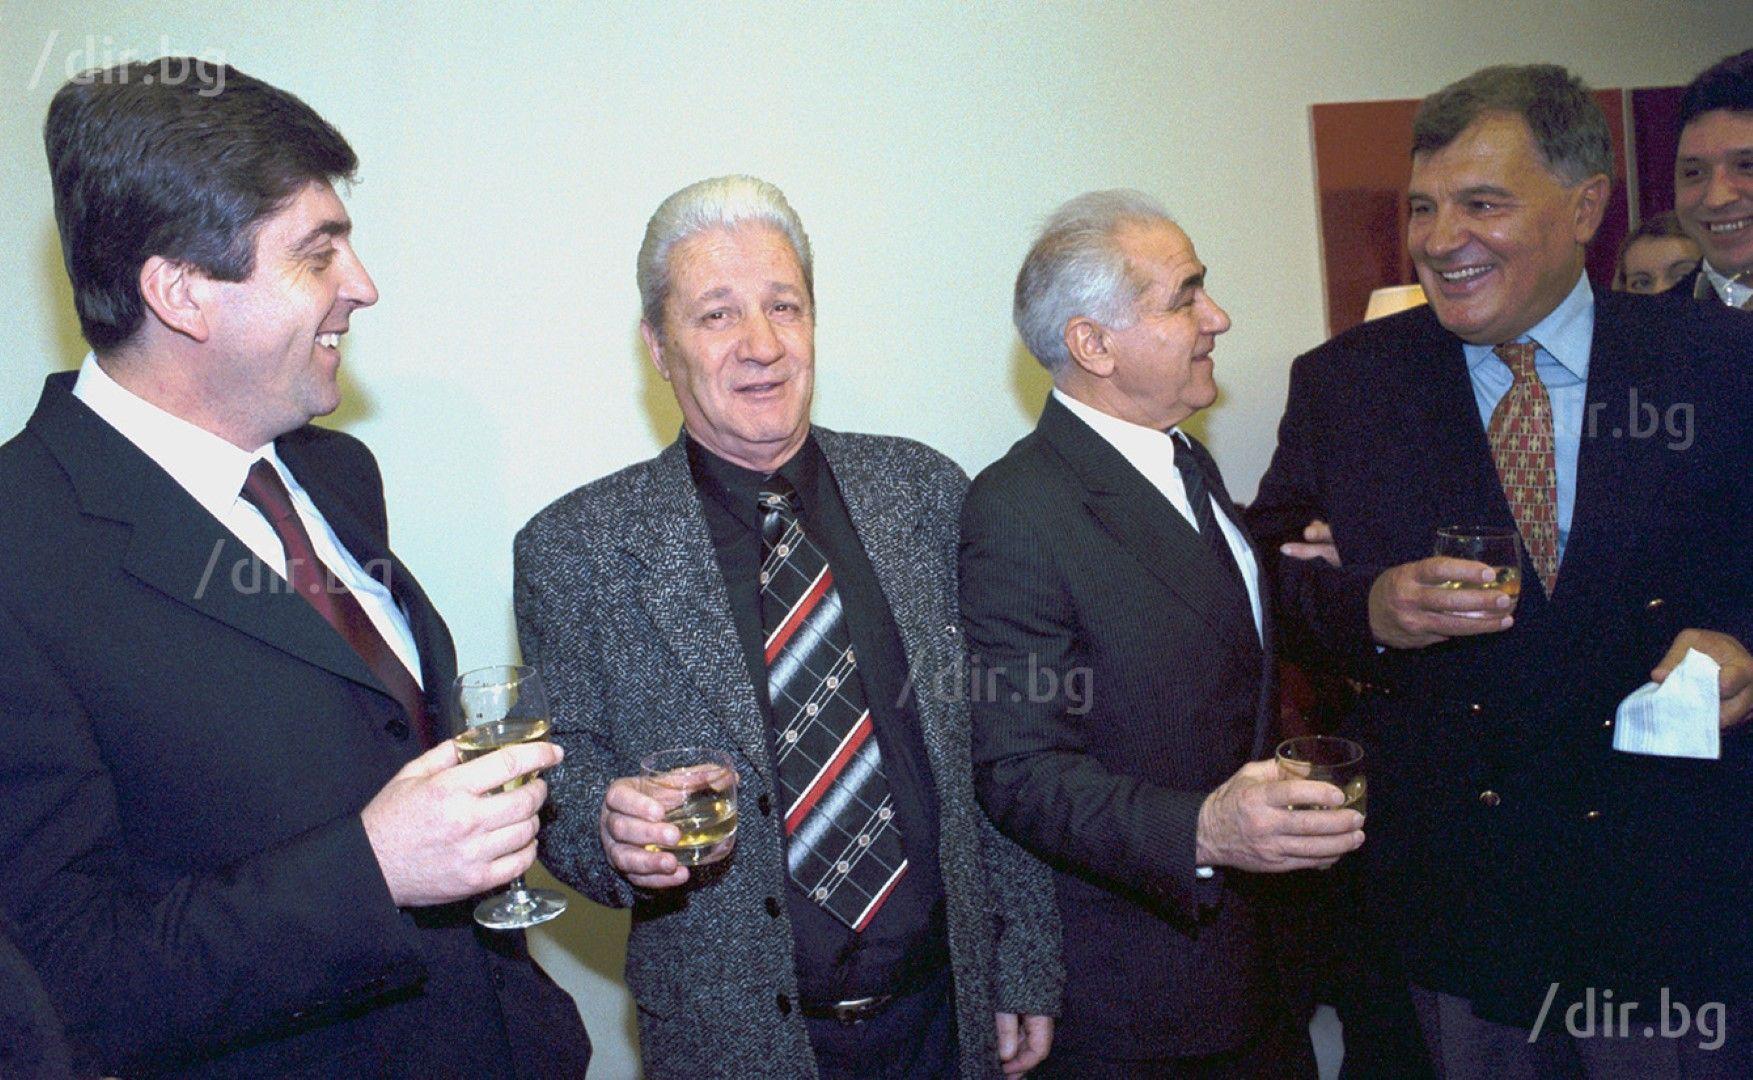 С футболните легенди Иван Колев и Гацо Стоянов, и президента Георги Първанов. Снимка: ИВАН ГРИГОРОВ